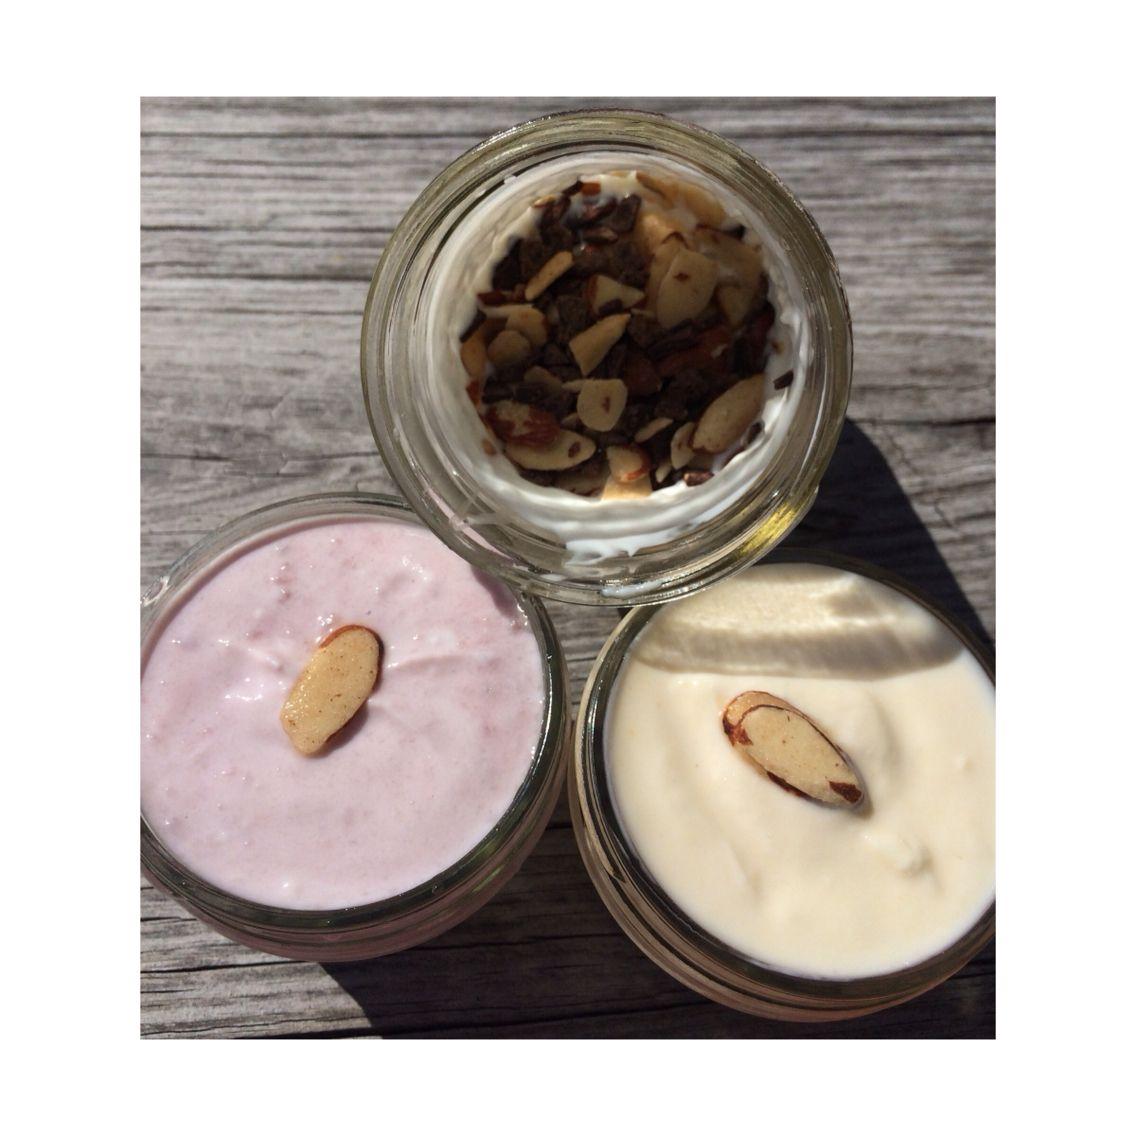 Chobani Greek Yogurt Flip in Almond Coco Loco, Chobani Greek Yogurt ...